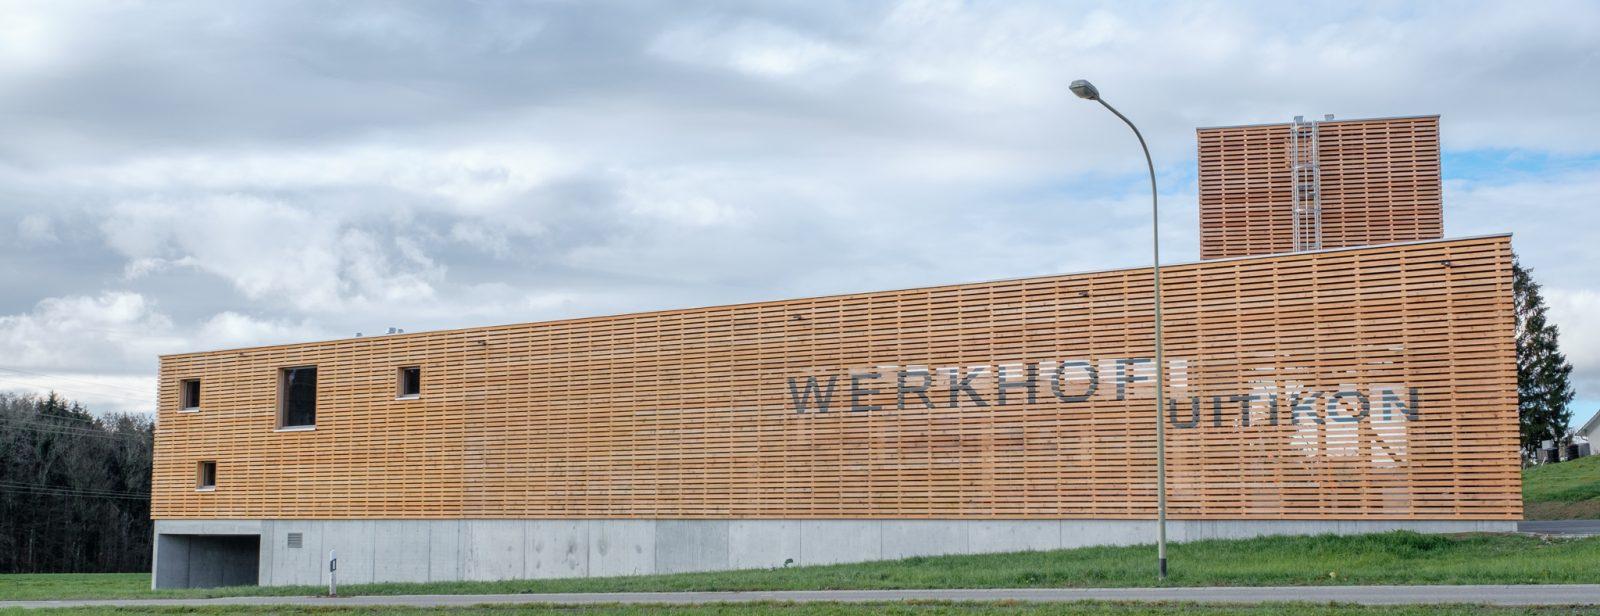 Werkhof, Uitikon-Waldegg